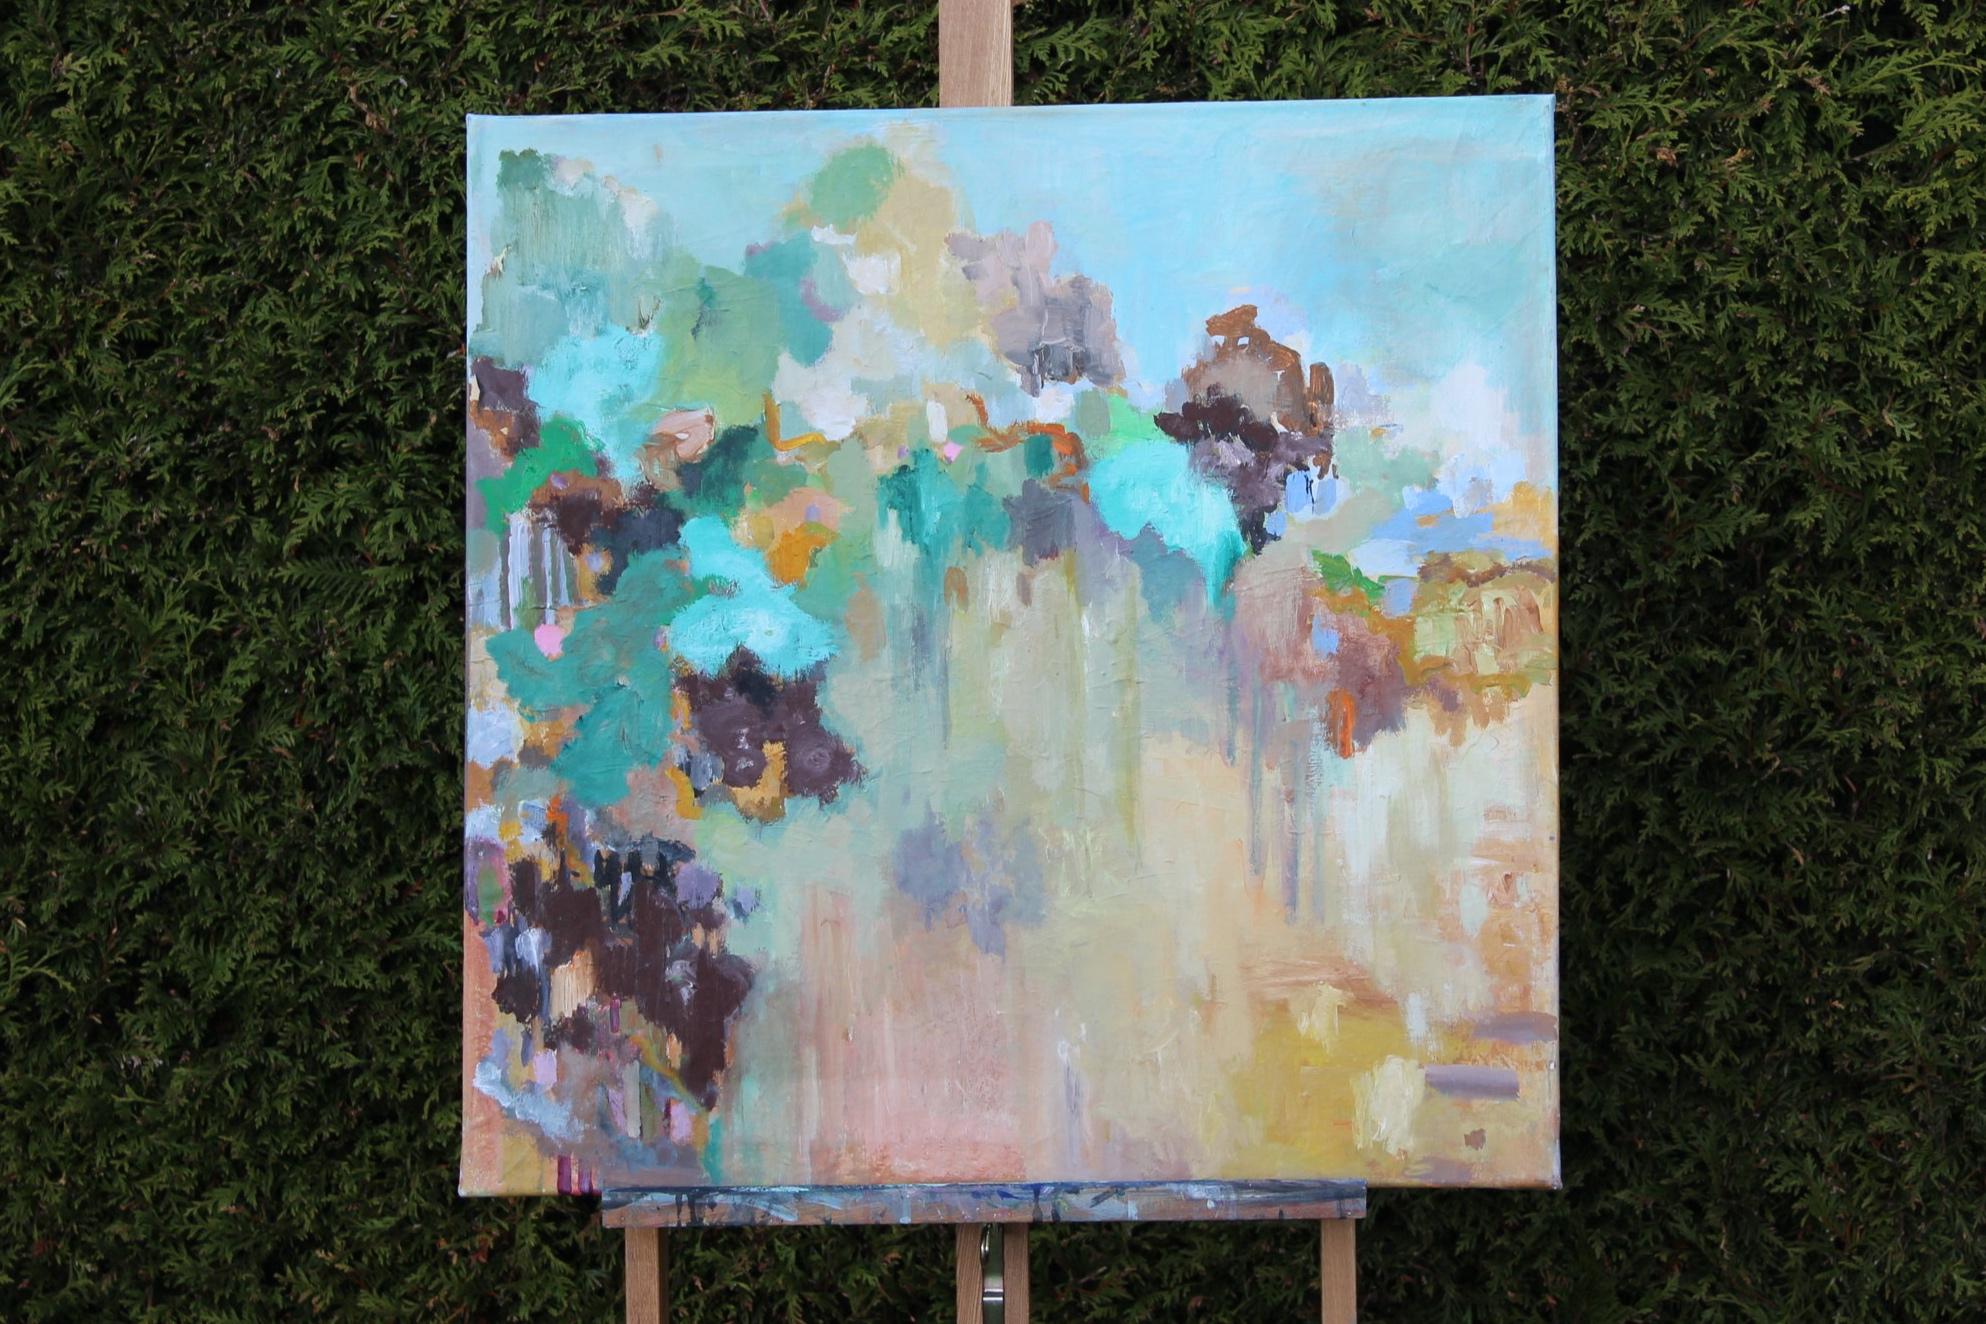 Dunes 71 x 71 x 2 cm oils and acrylics on canvas